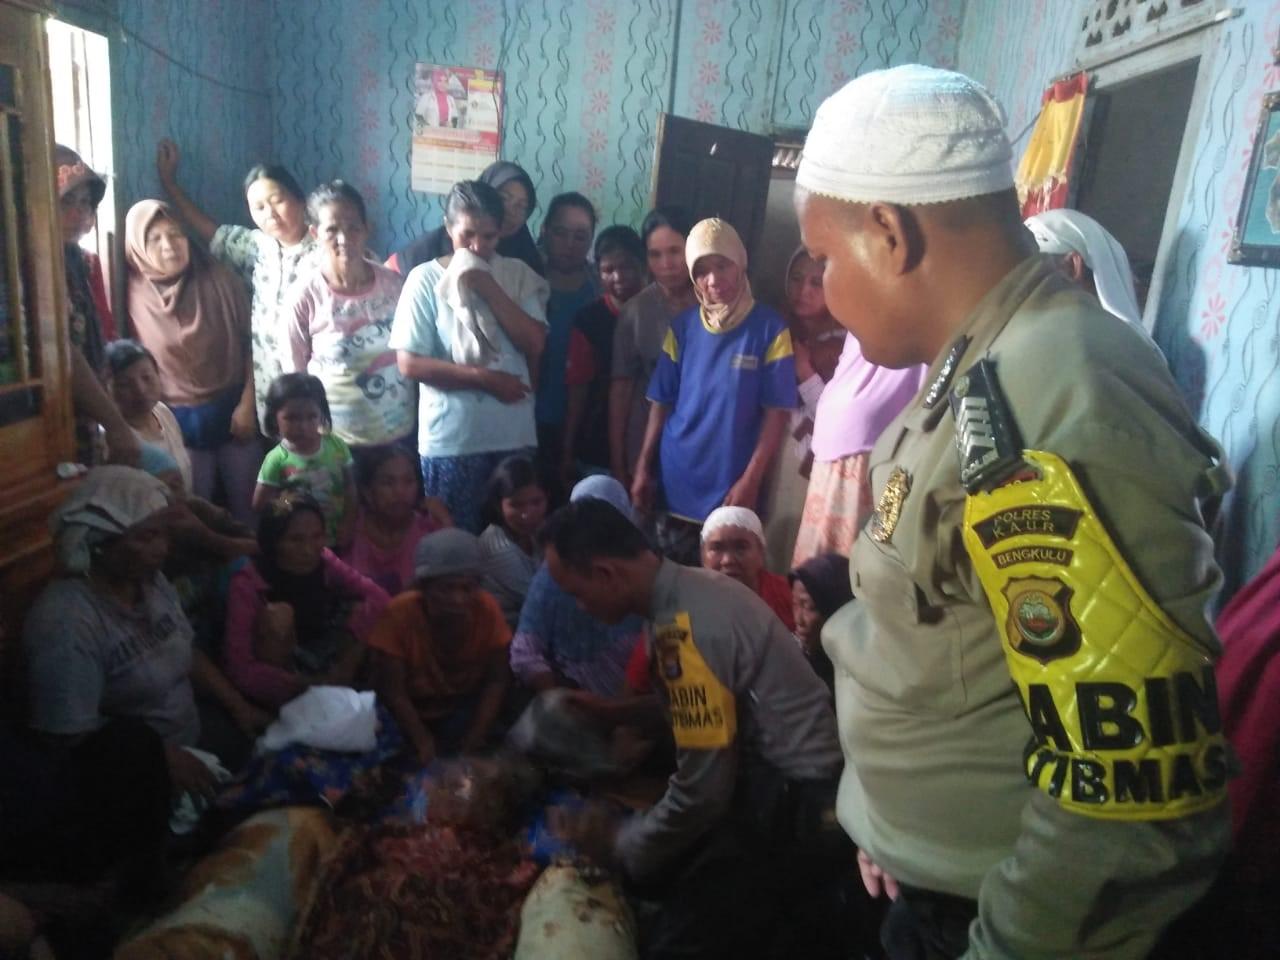 Bersama Warga, Bhabinkamtibmas dan Babinsa Evakuasi Korban Hanyut dari Air Padang Guci